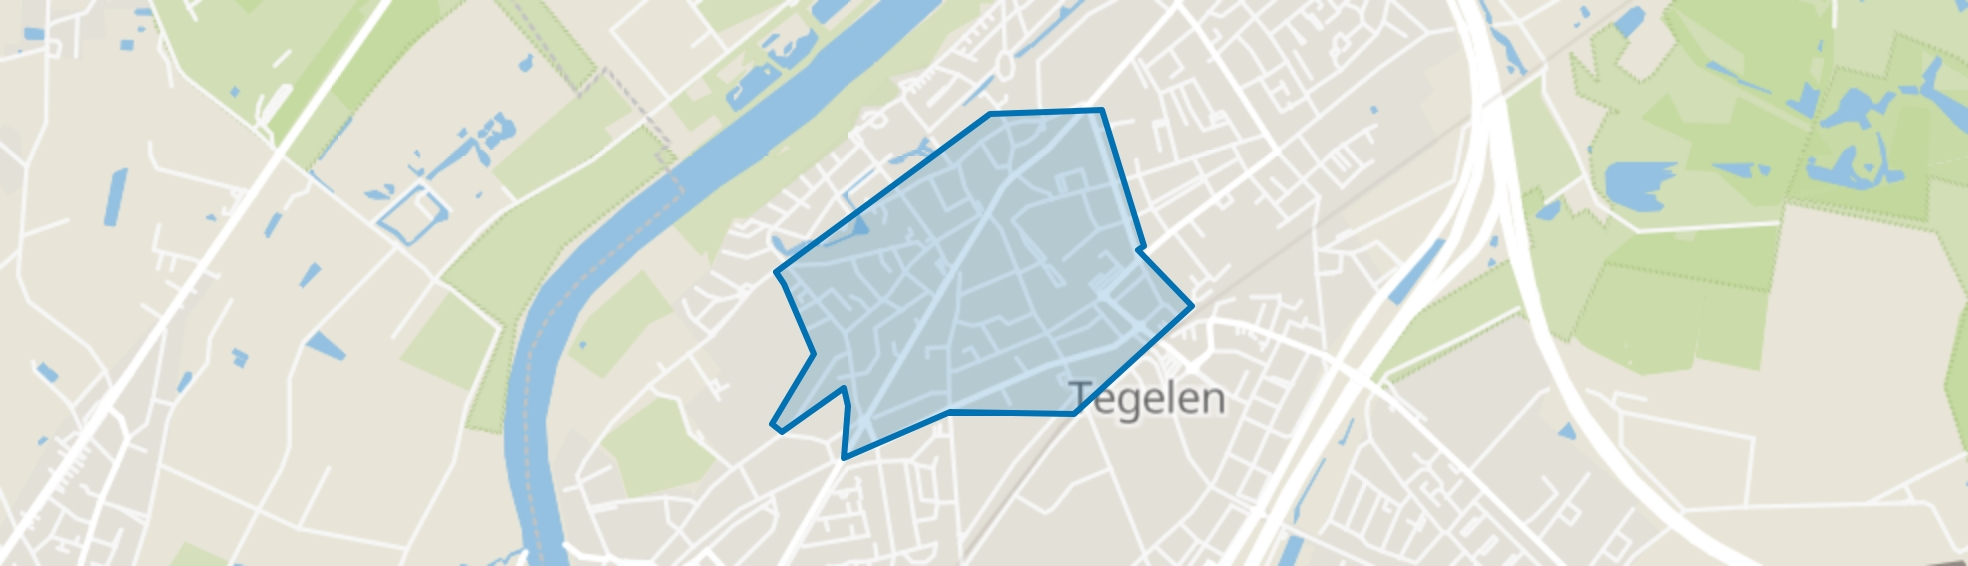 Tegelen-Centrum, Tegelen map